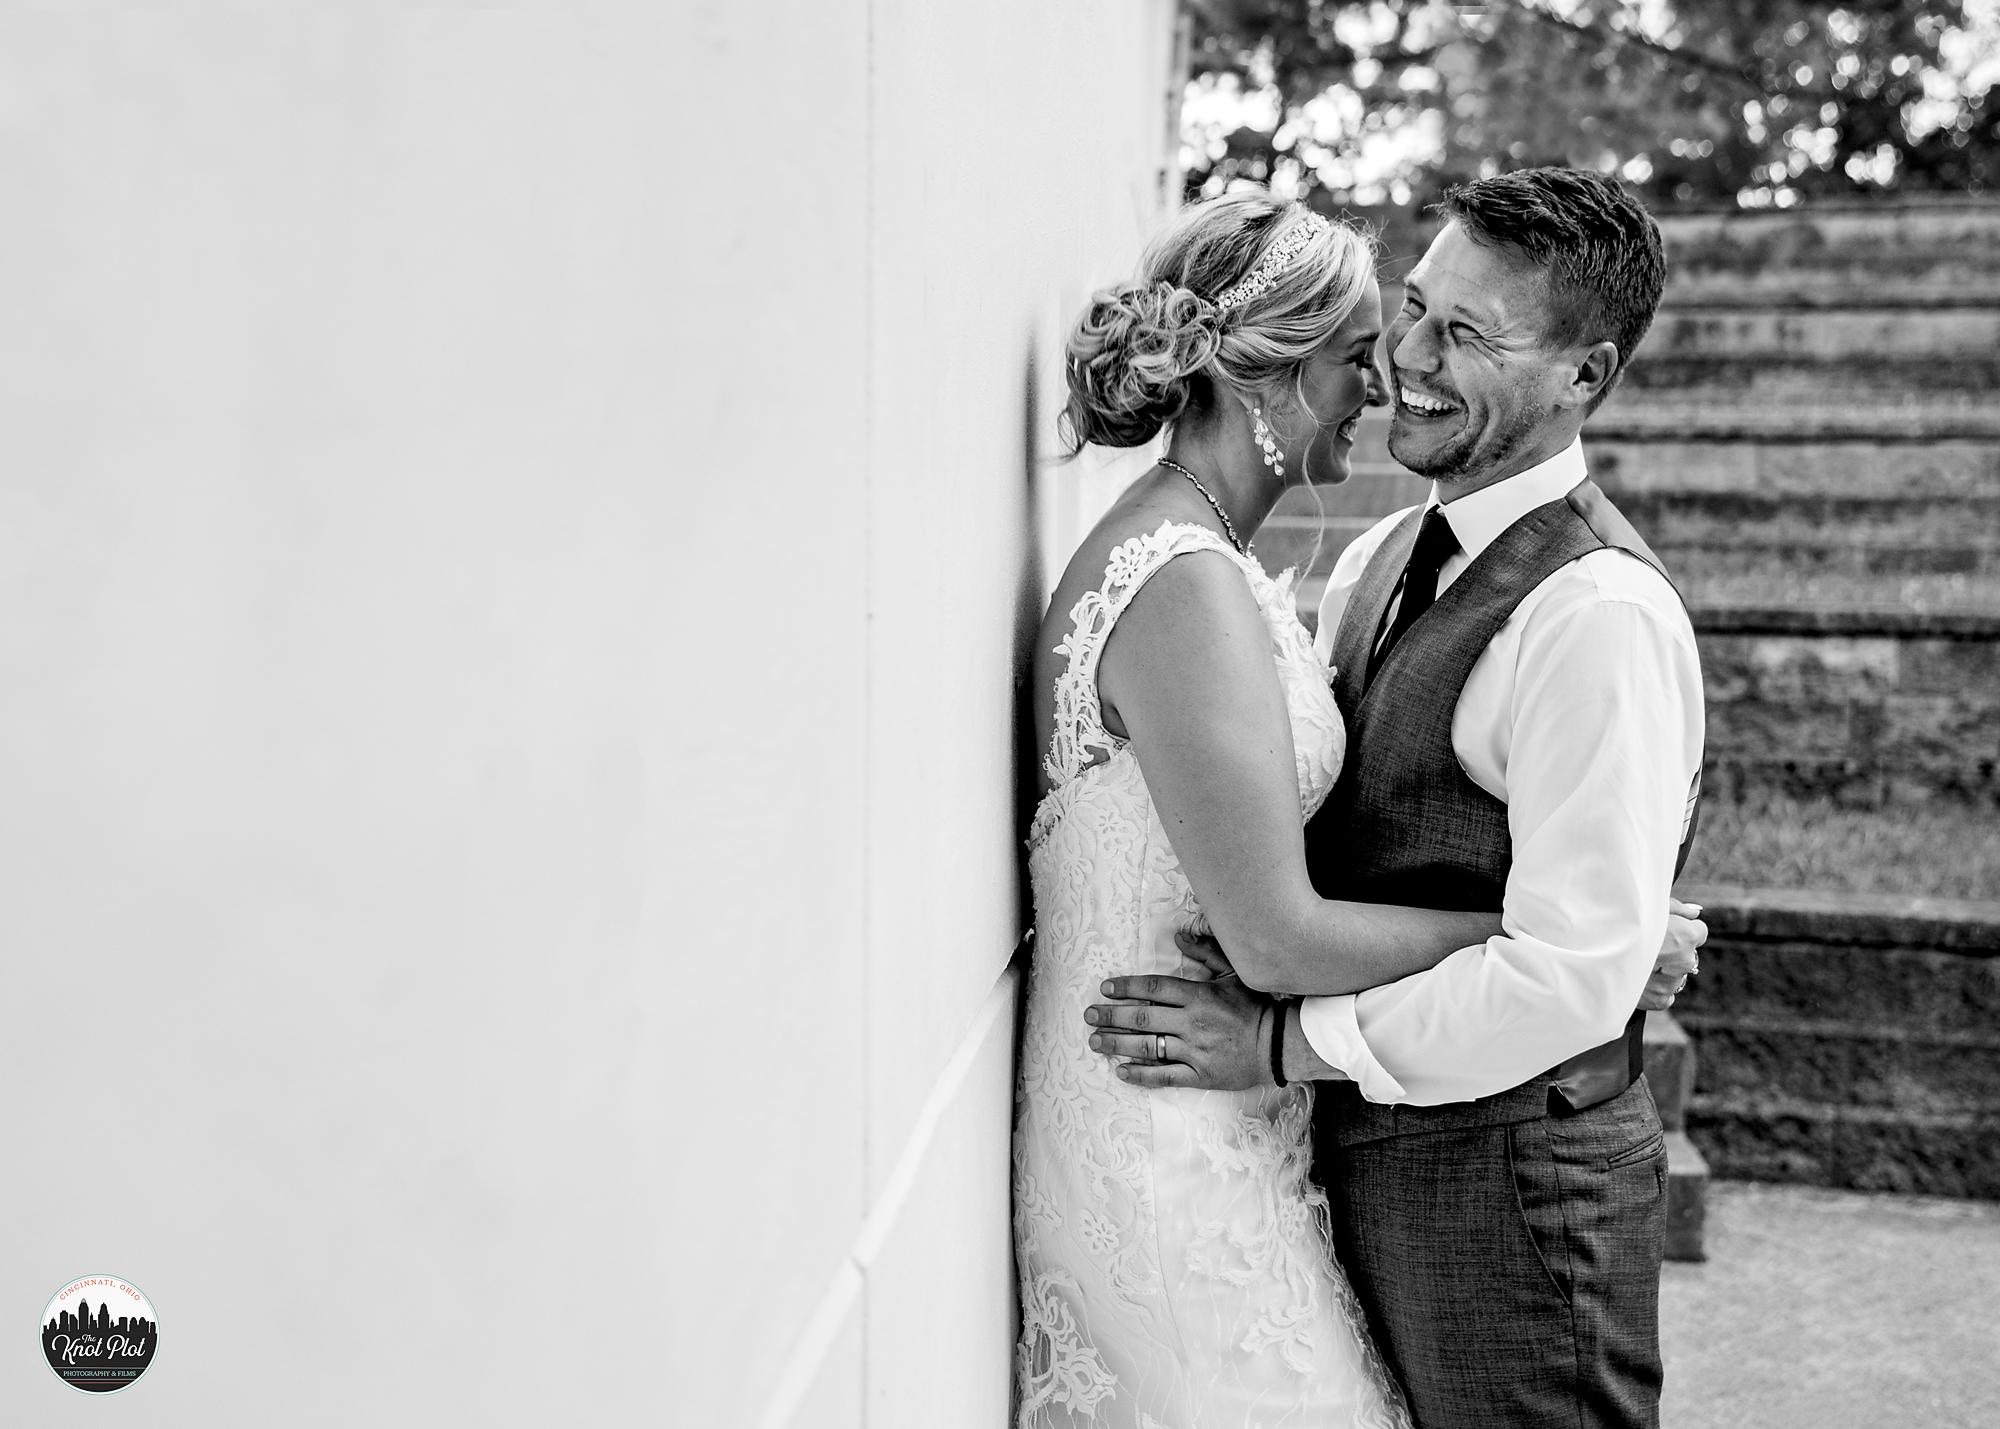 Southgate-Community-Center-KY-Wedding-Photography-24.jpg